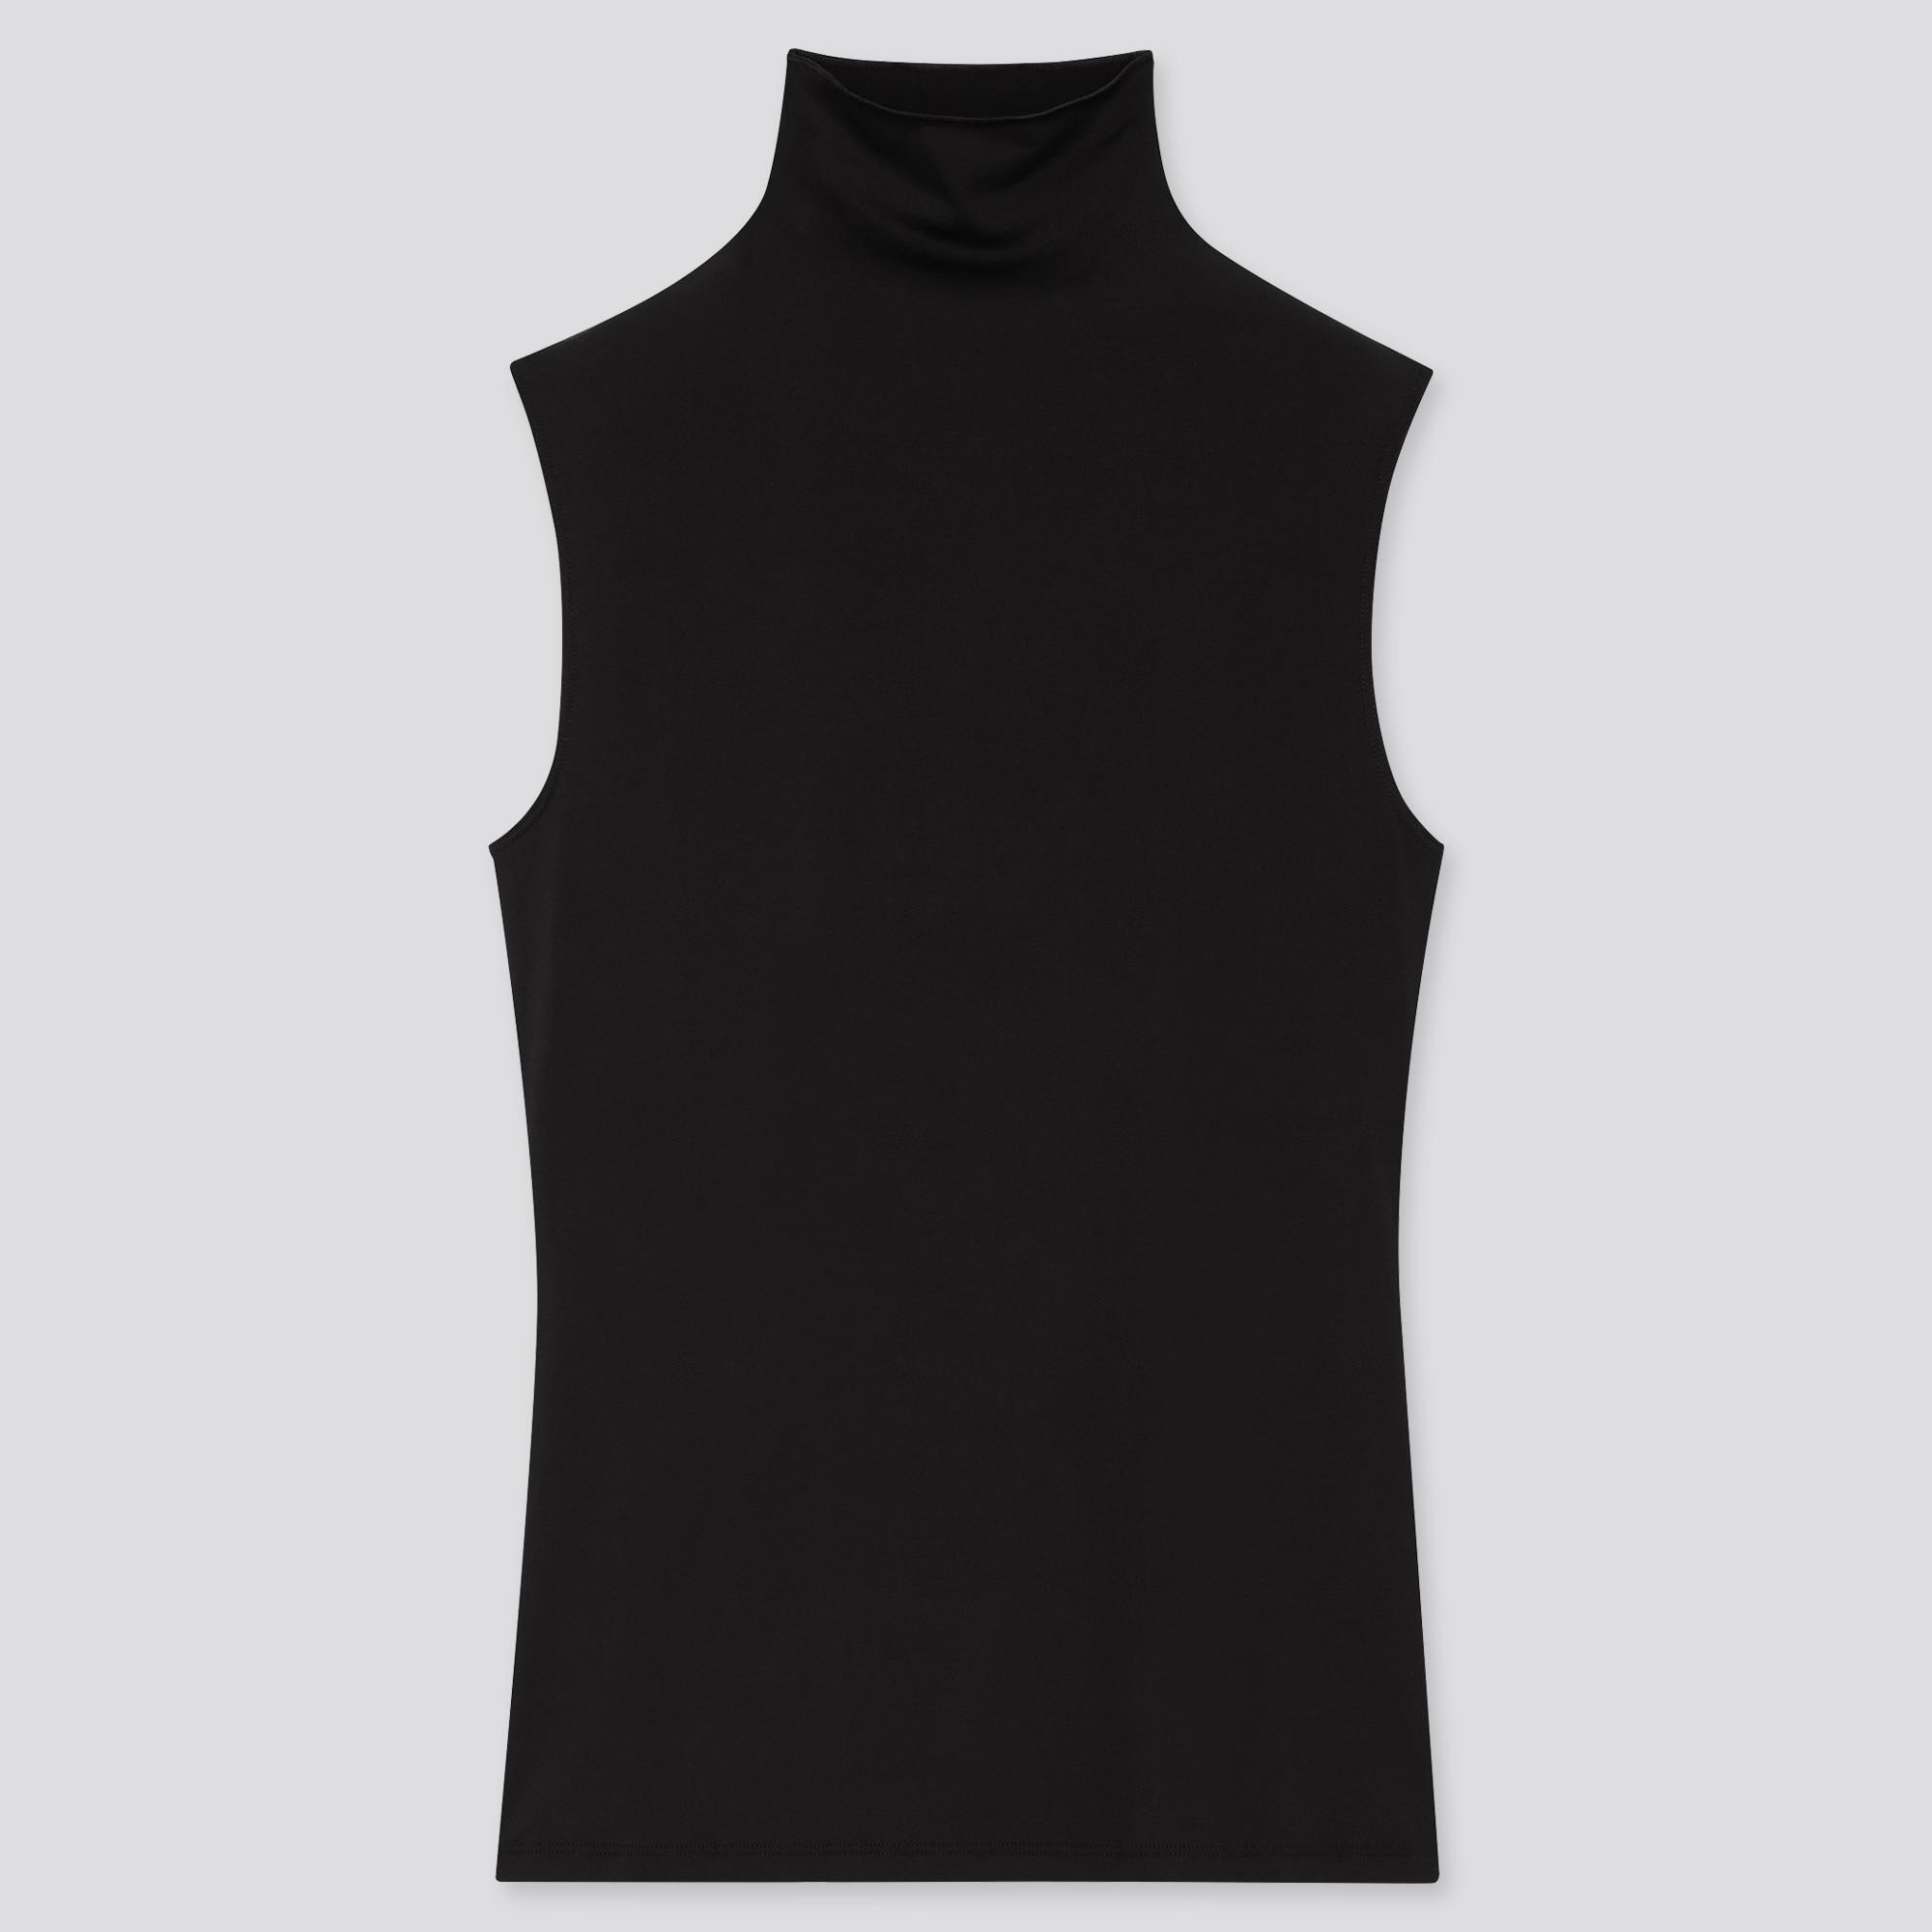 WOMEN AIRism UV PROTECTION HIGH-NECK SLEEVELESS T-SHIRT